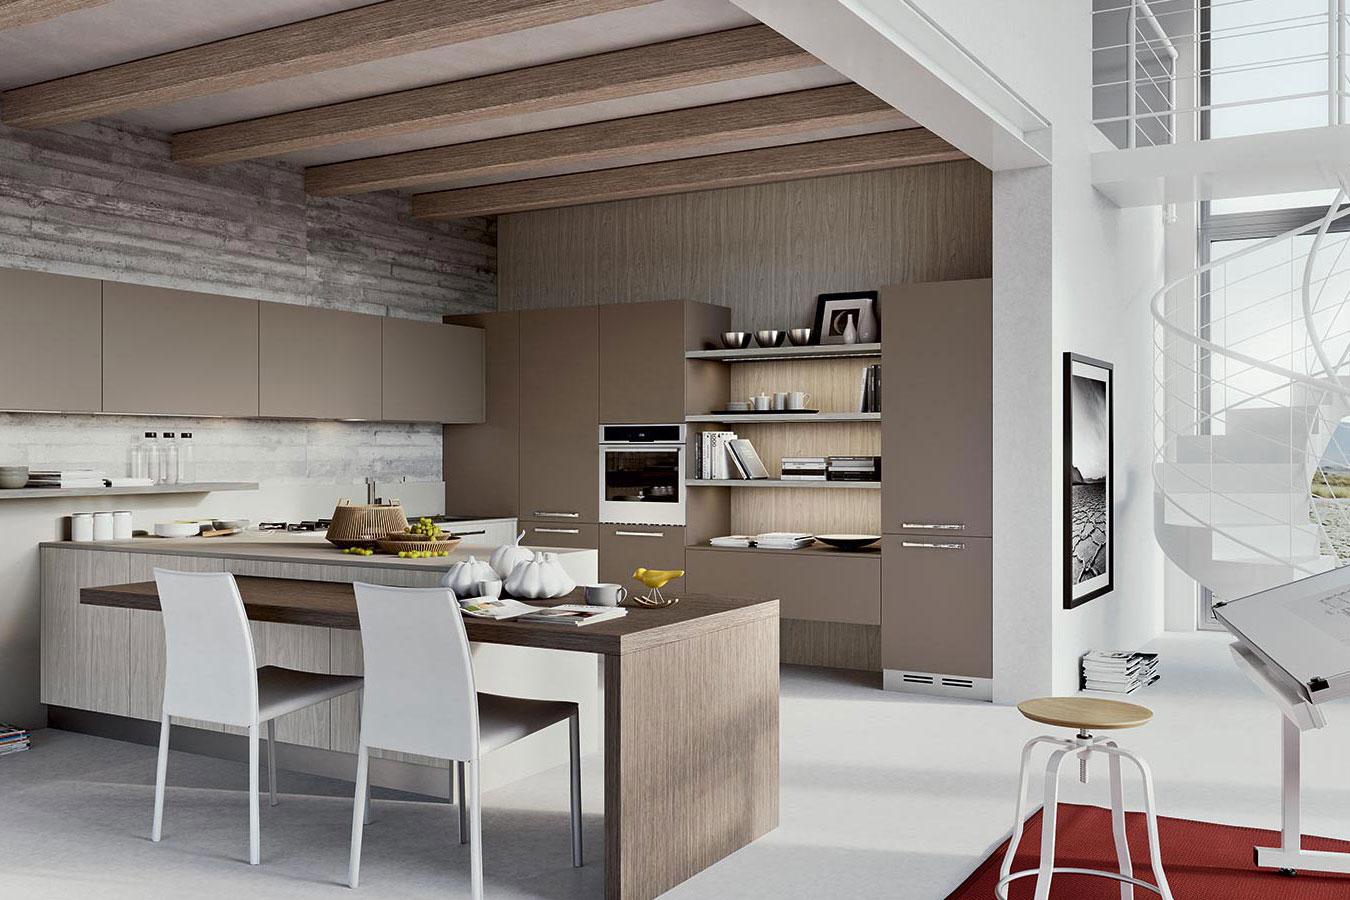 Tavolo Bancone Cucina.Arredo3 Cucina Luna 3 Moderna Design Penisola Tavolo Pranzo